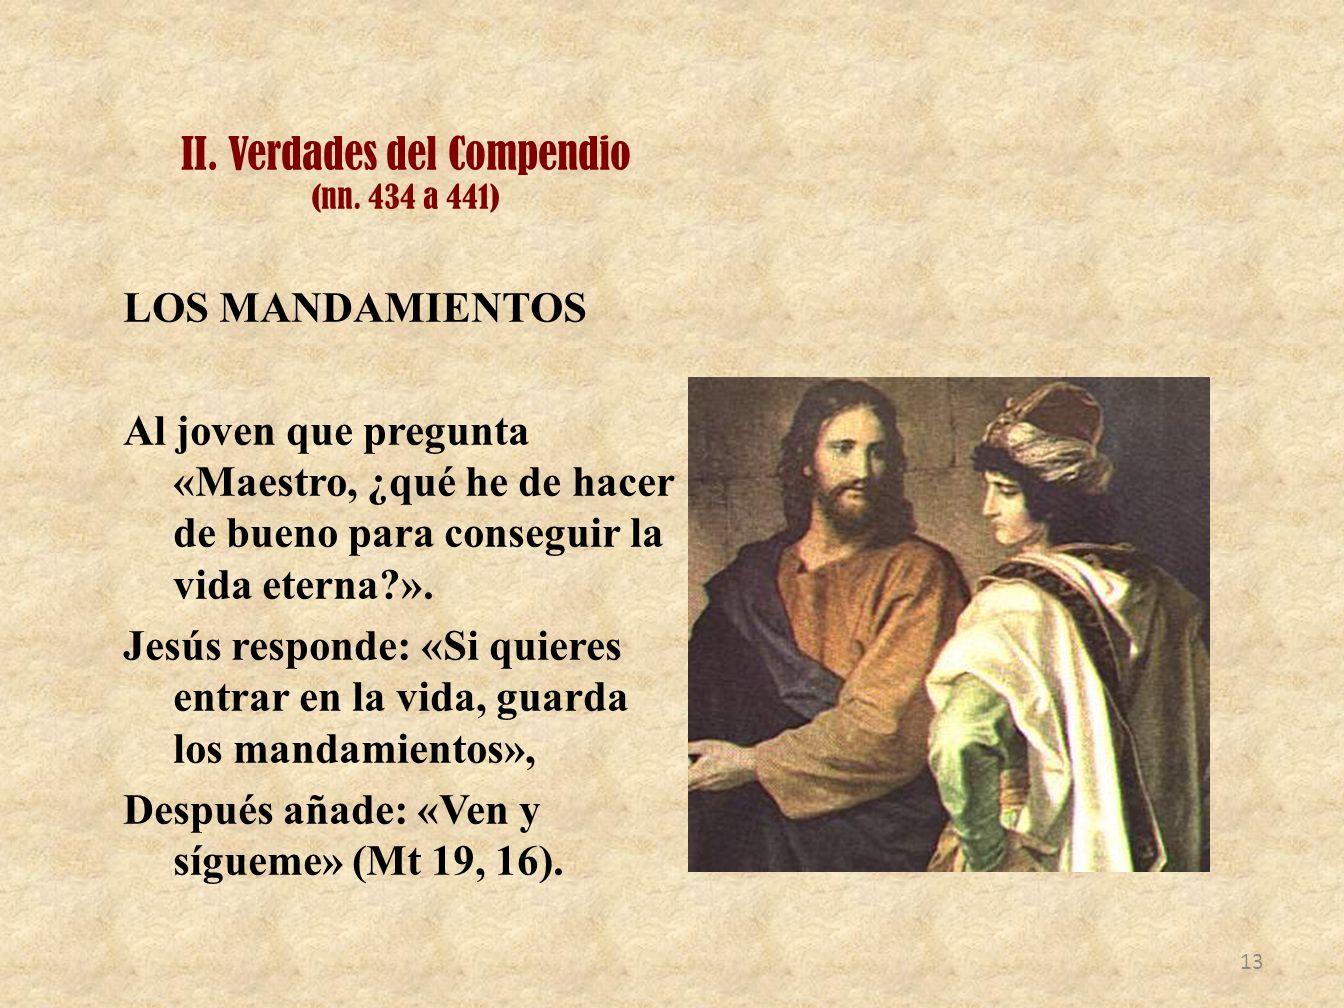 II. Verdades del Compendio (nn. 434 a 441)